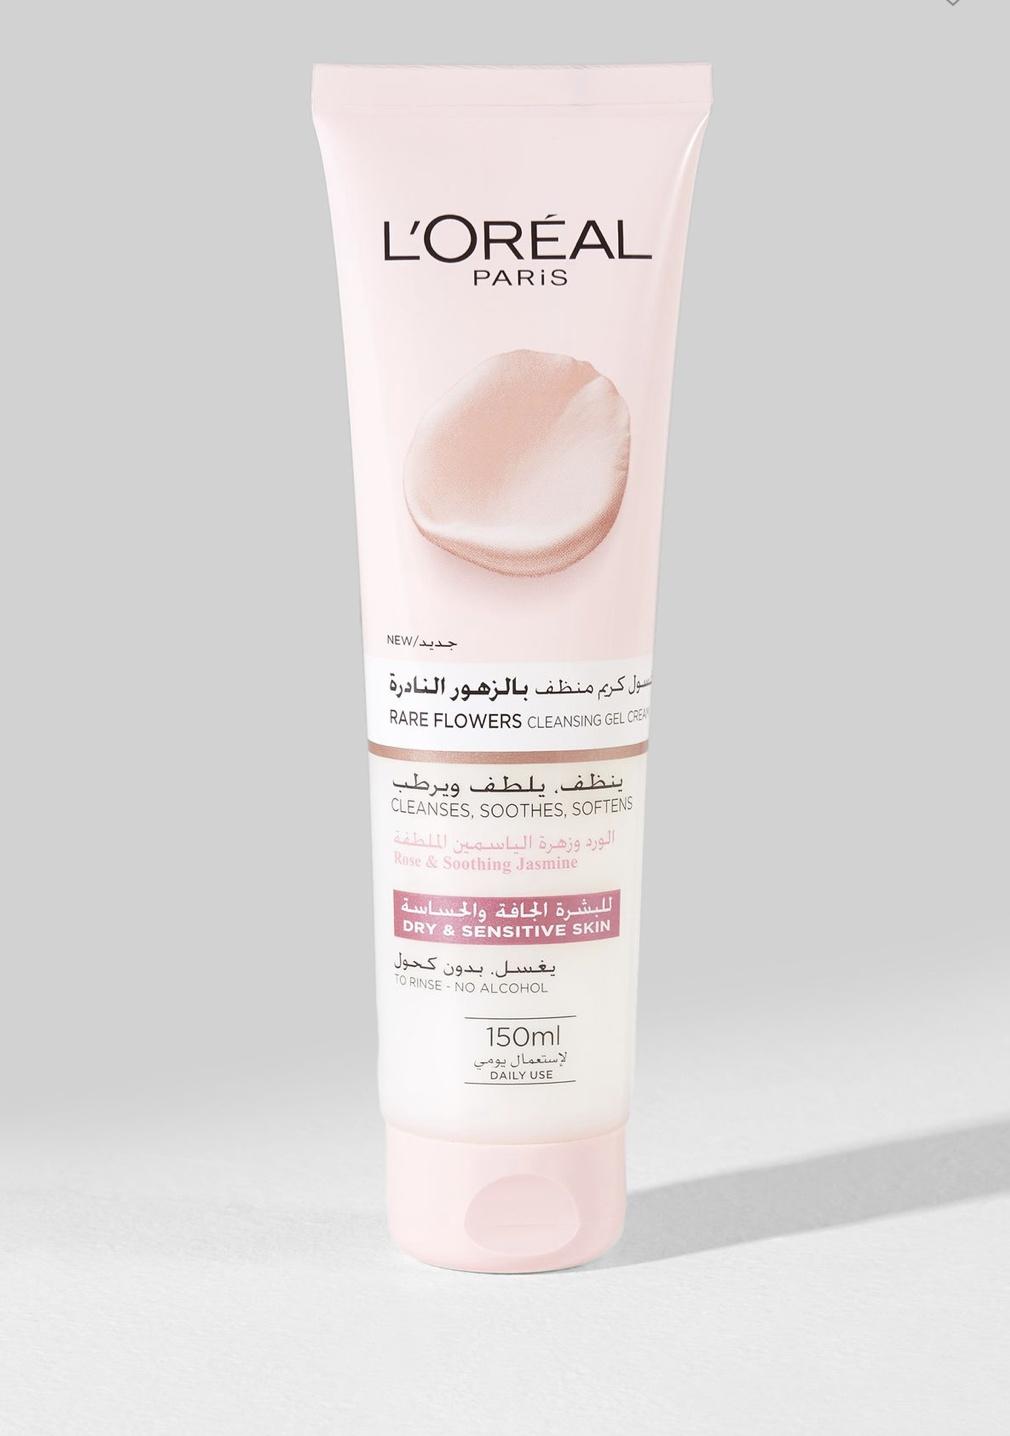 L'Oreal Paris Rare Flowers Cleansing Gel Cream, Dry And Sensitive Skin